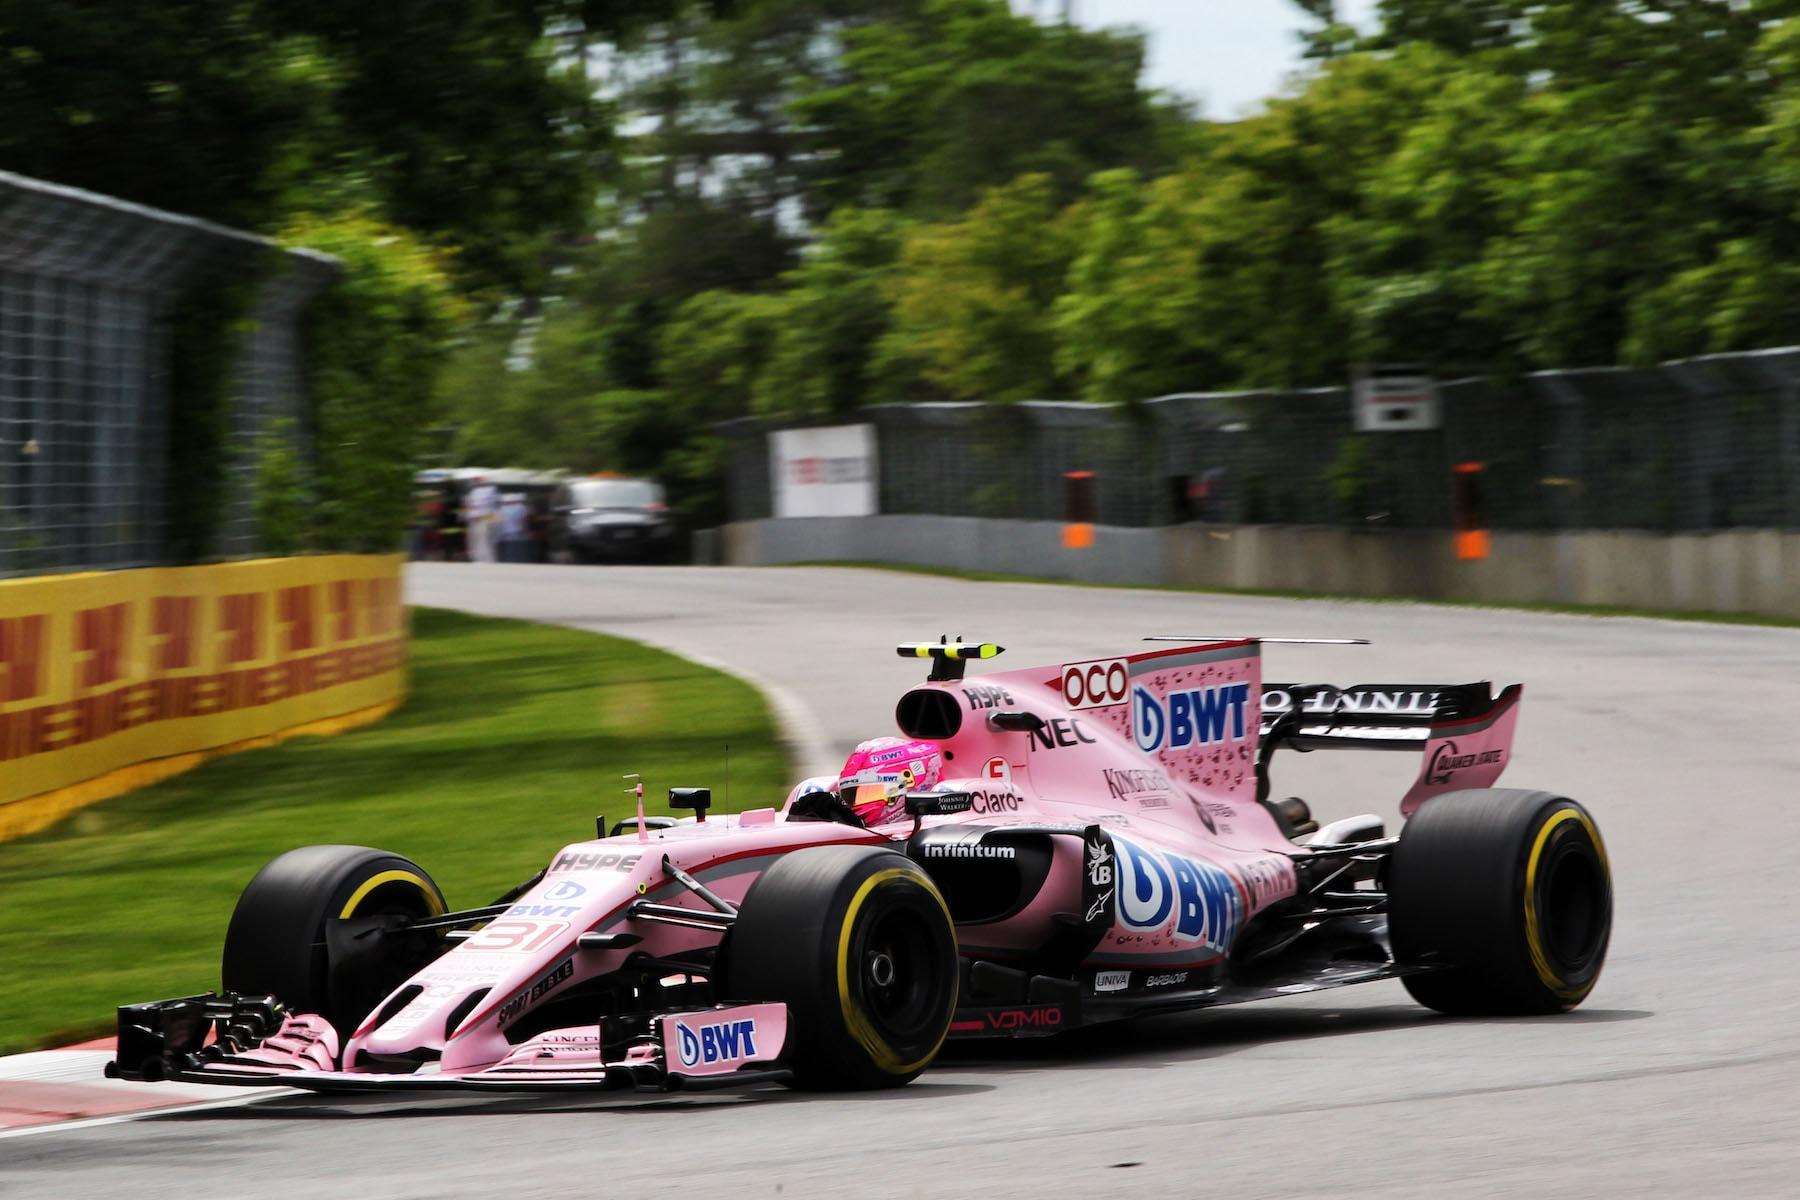 2017 Esteban Ocon | Force India VJM10 | 2017 Canadian GP FP2 1 copy.jpg